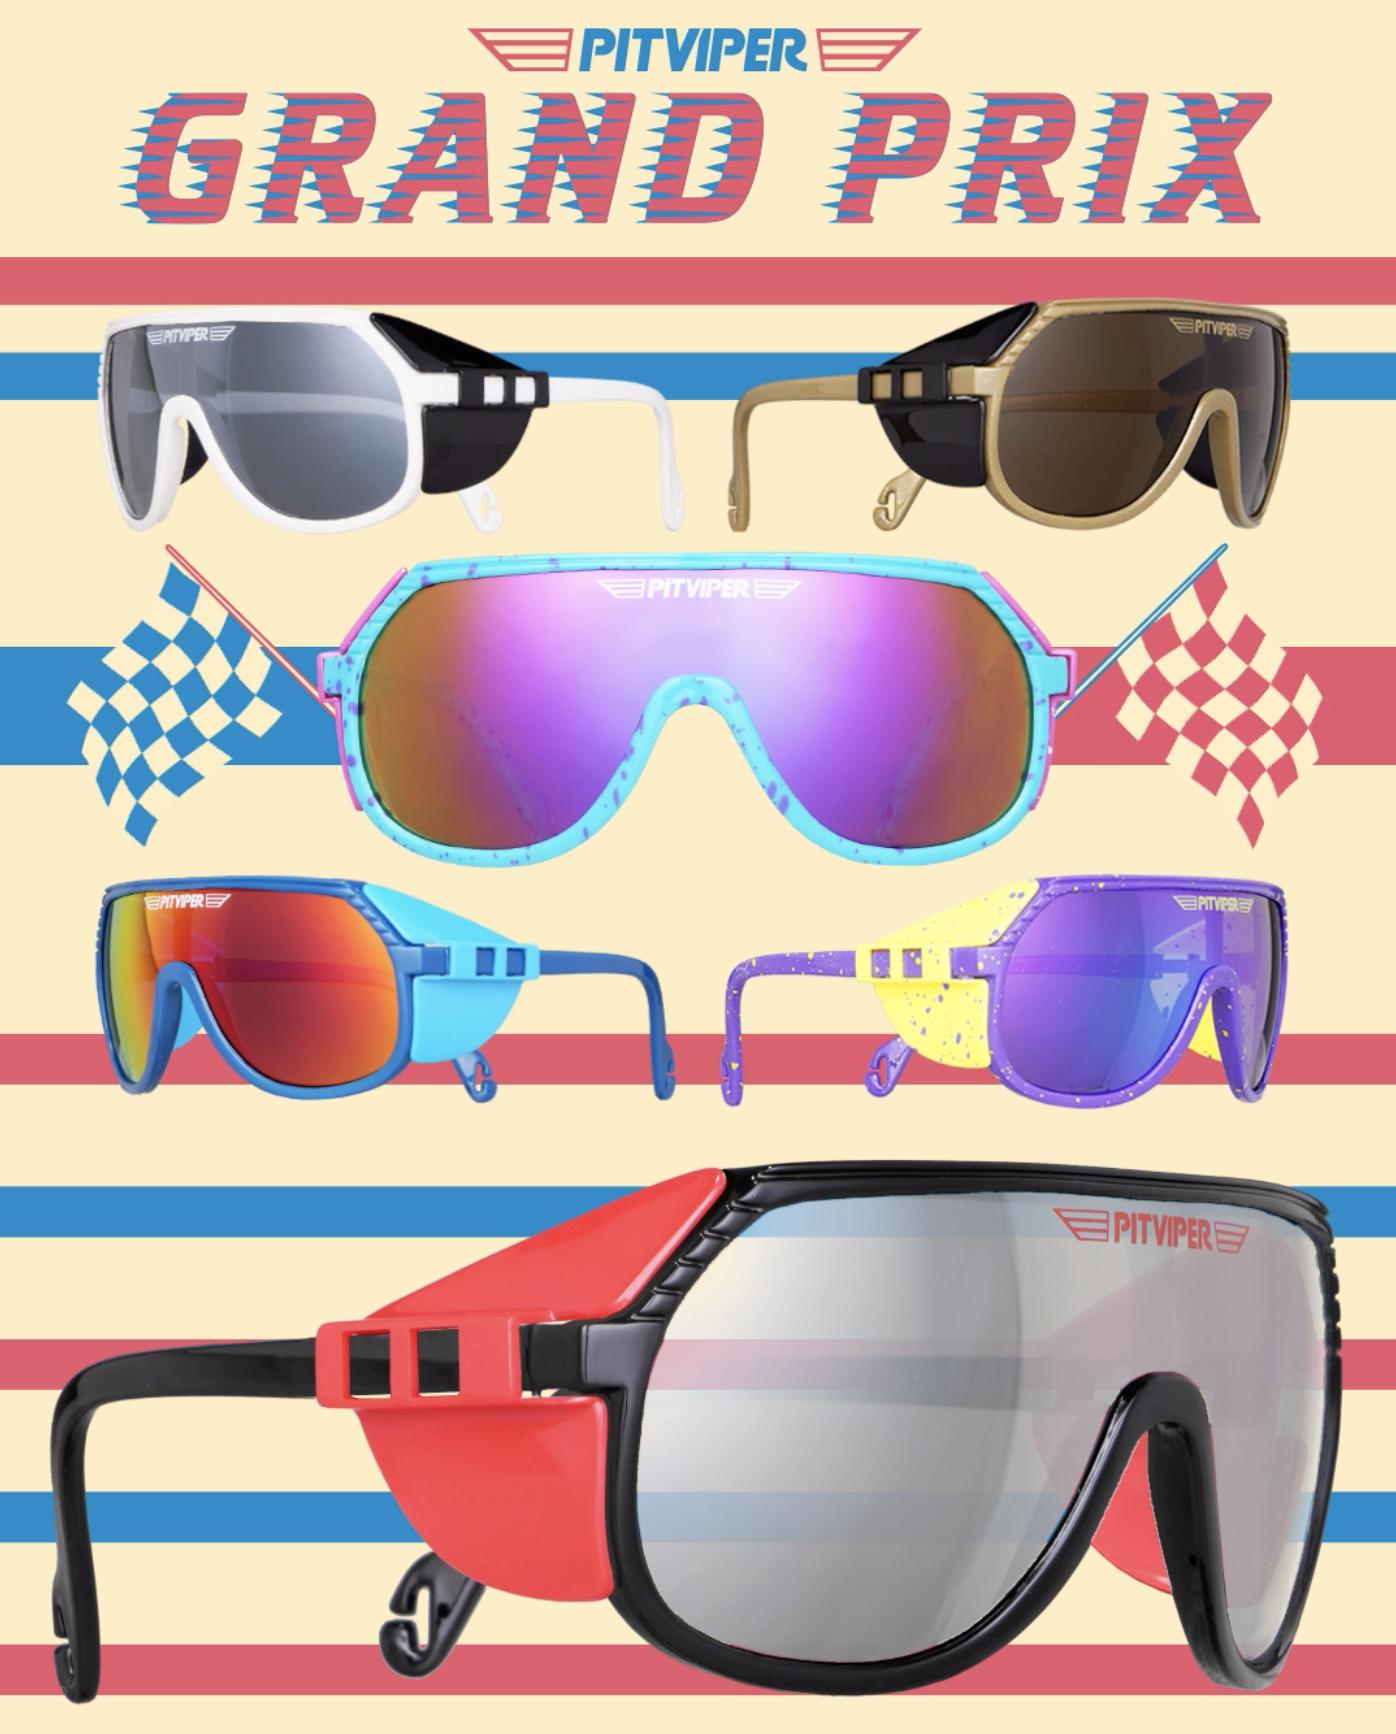 Pit Viper Grand Prix Options